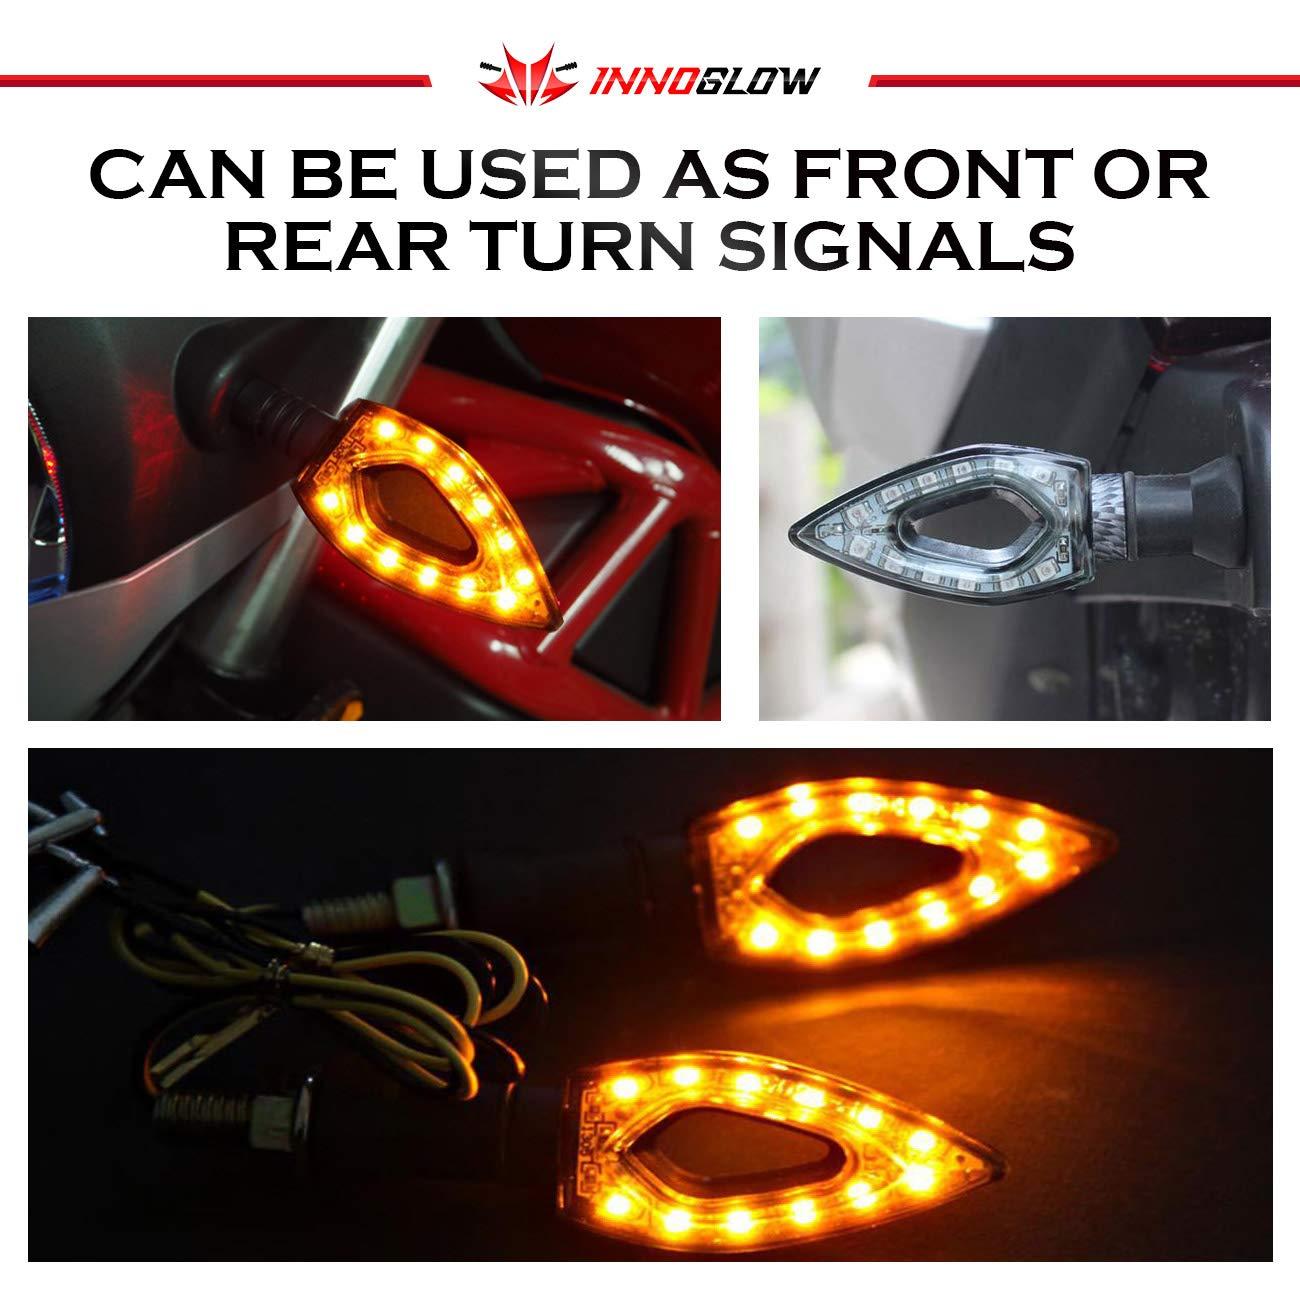 4 PCS INNOGLOW Motorcycle Turn Signal Lights 12V Universal Motorcycle Motorbike Indicator Blinker Amber Light Lamp for Yamaha Honda Suzuki Kawasaki